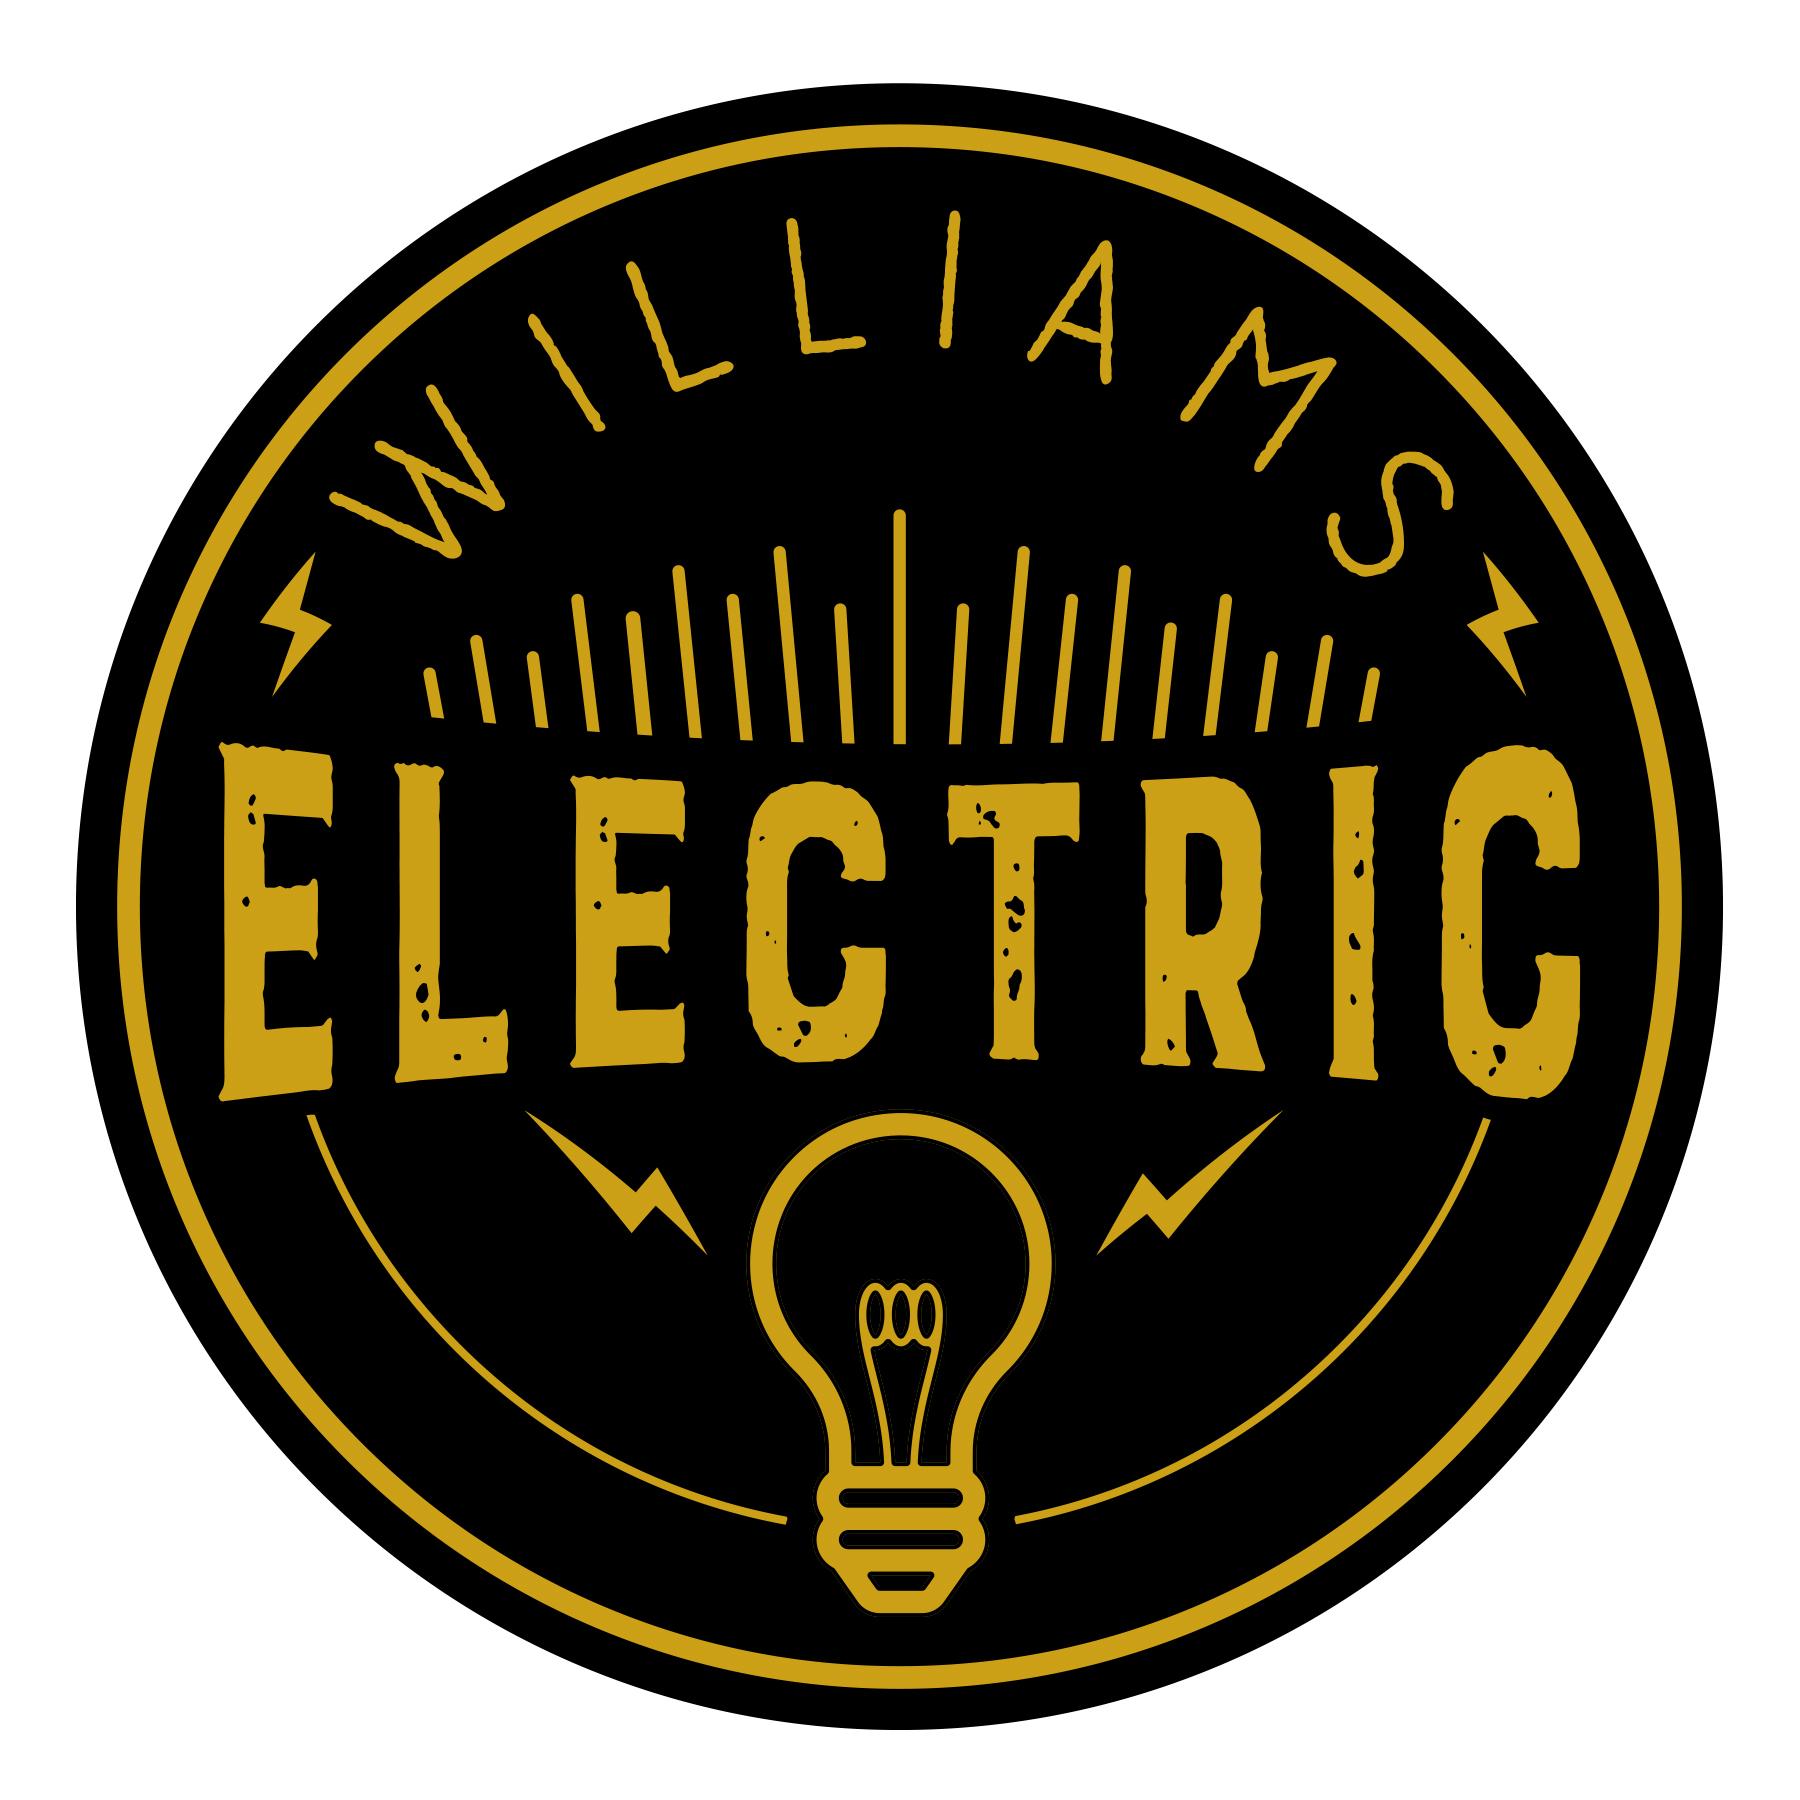 WilliamsElectric-HiRes.jpg